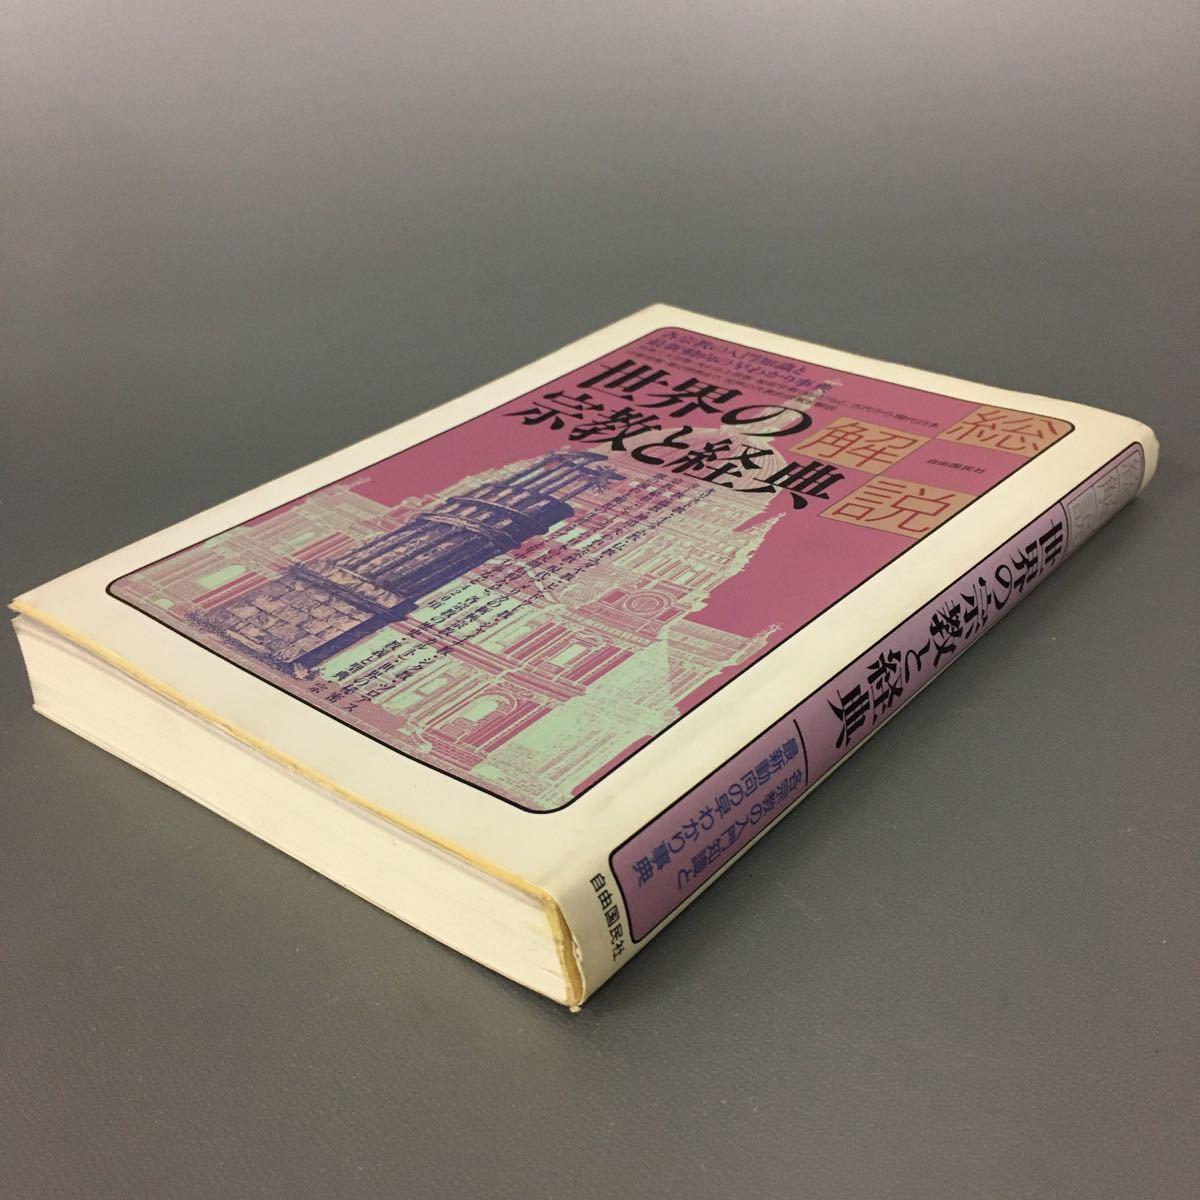 A) 世界の宗教と経典・総解説 1991年11月20日発行 自由国民社 長谷川秀記_画像2